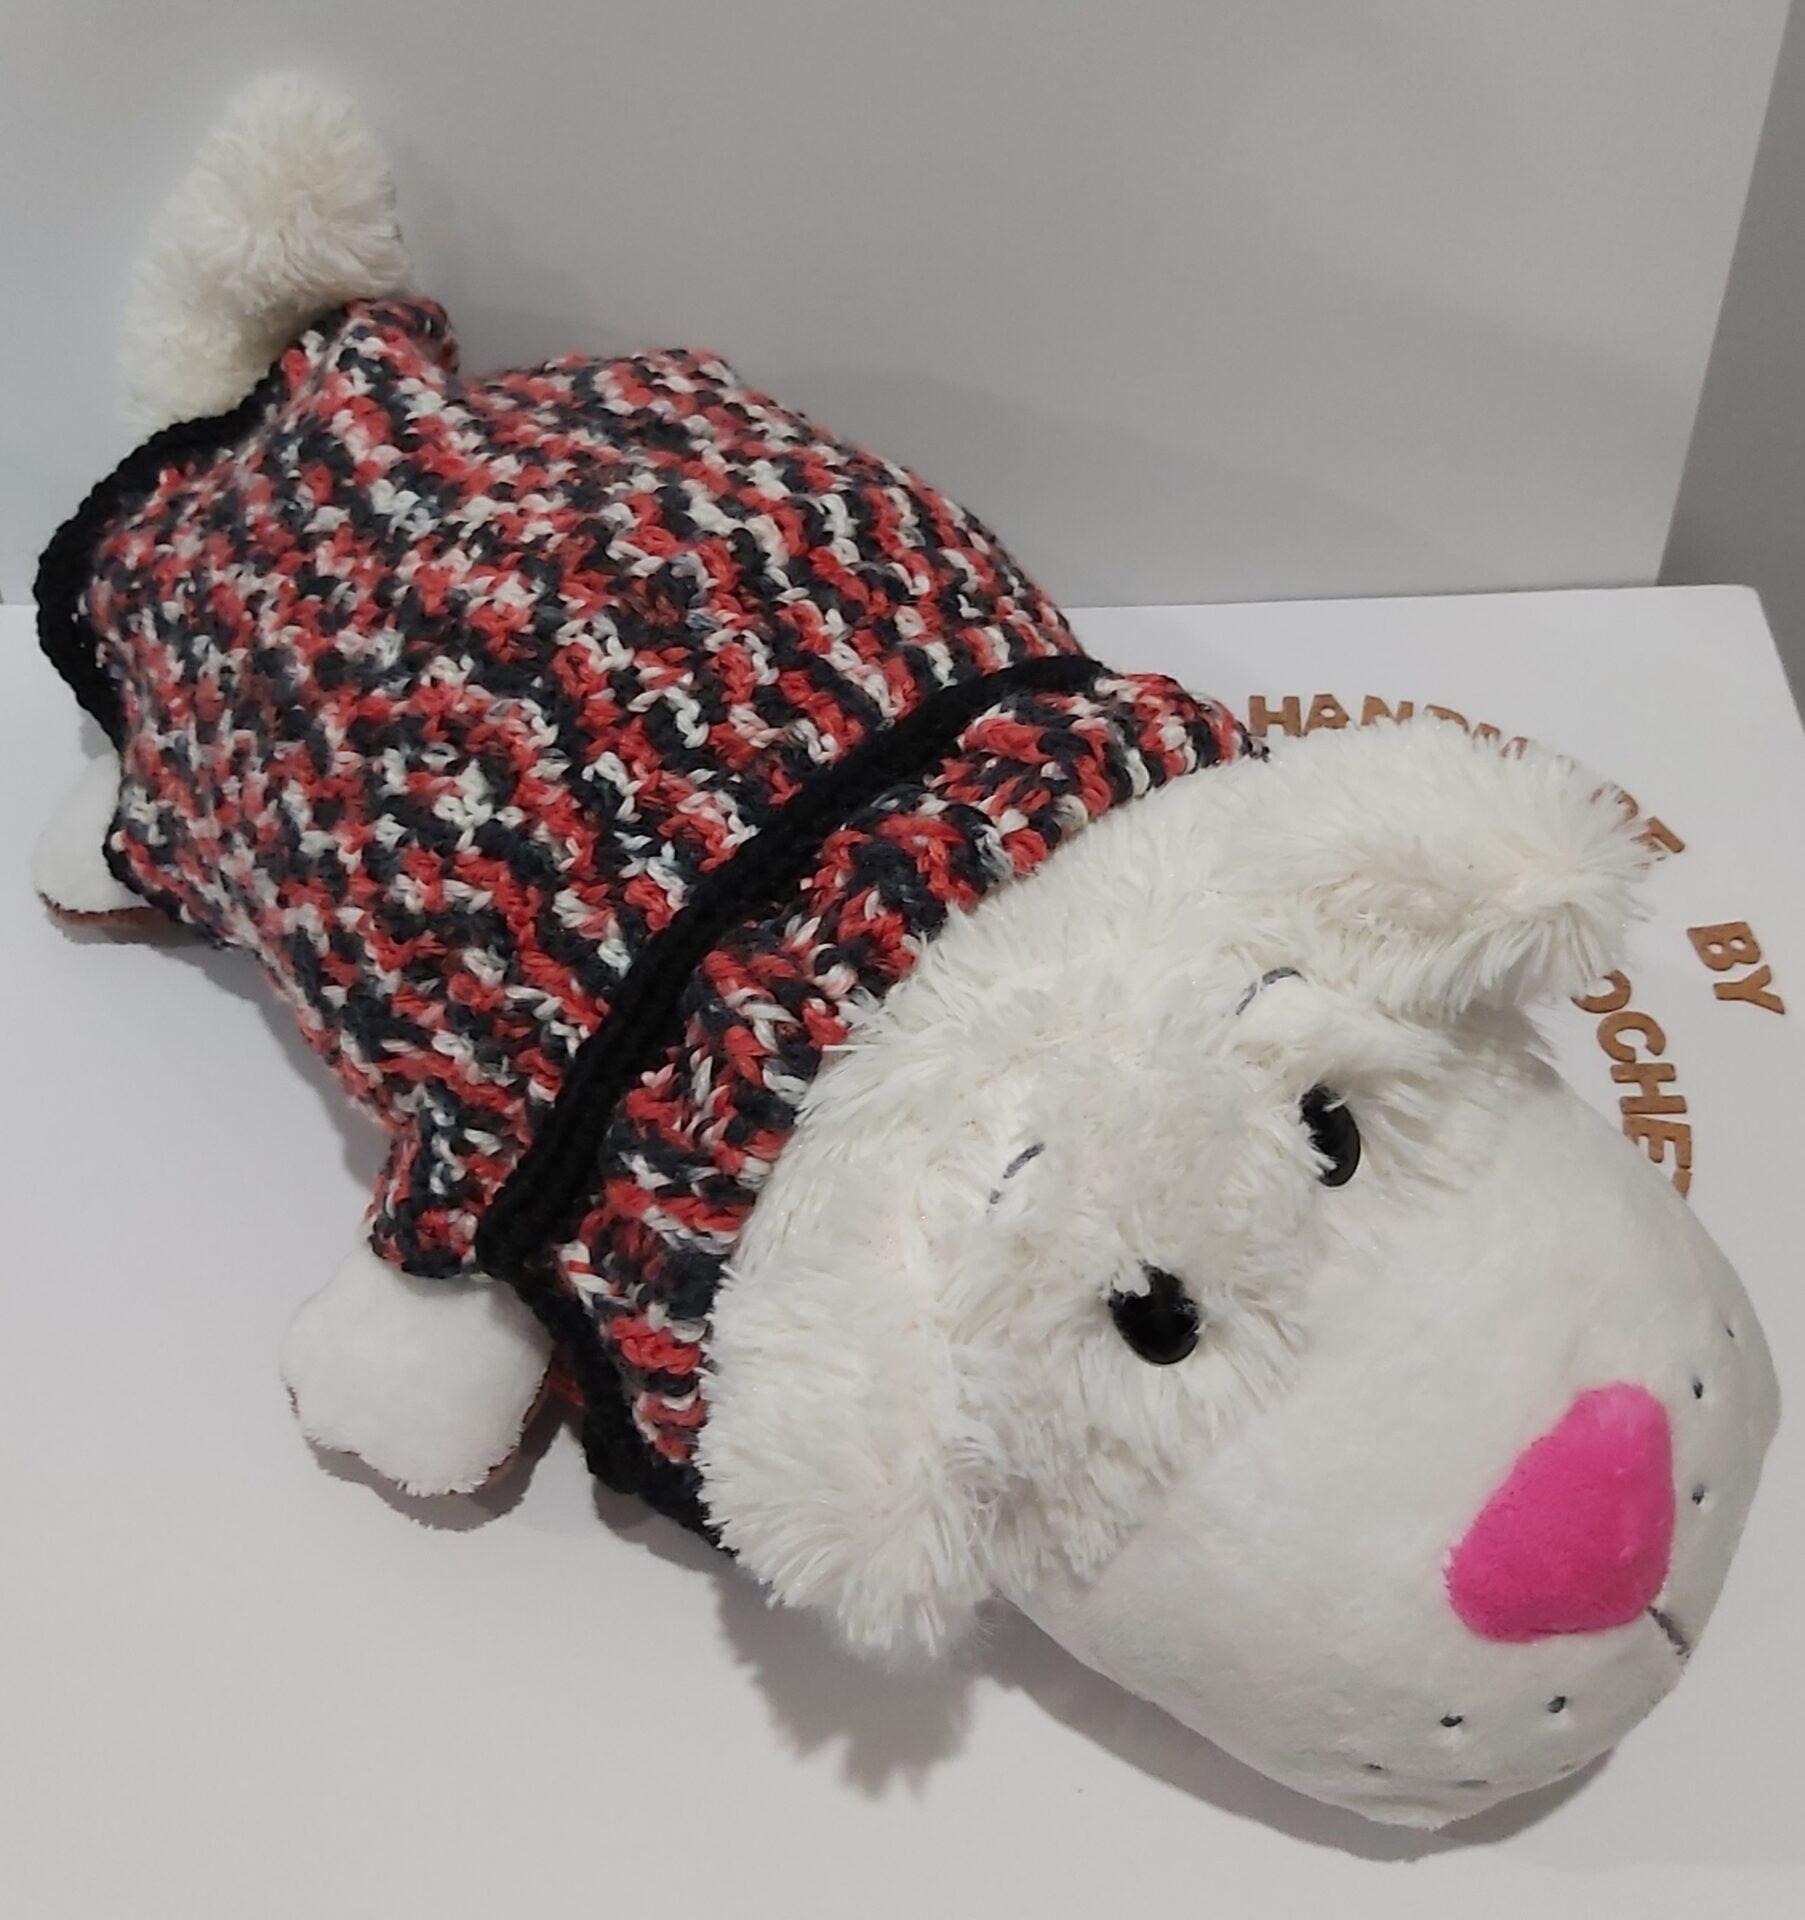 blackred-dog-sweater-handmade-by-u-knit-crochet-by-Ivy